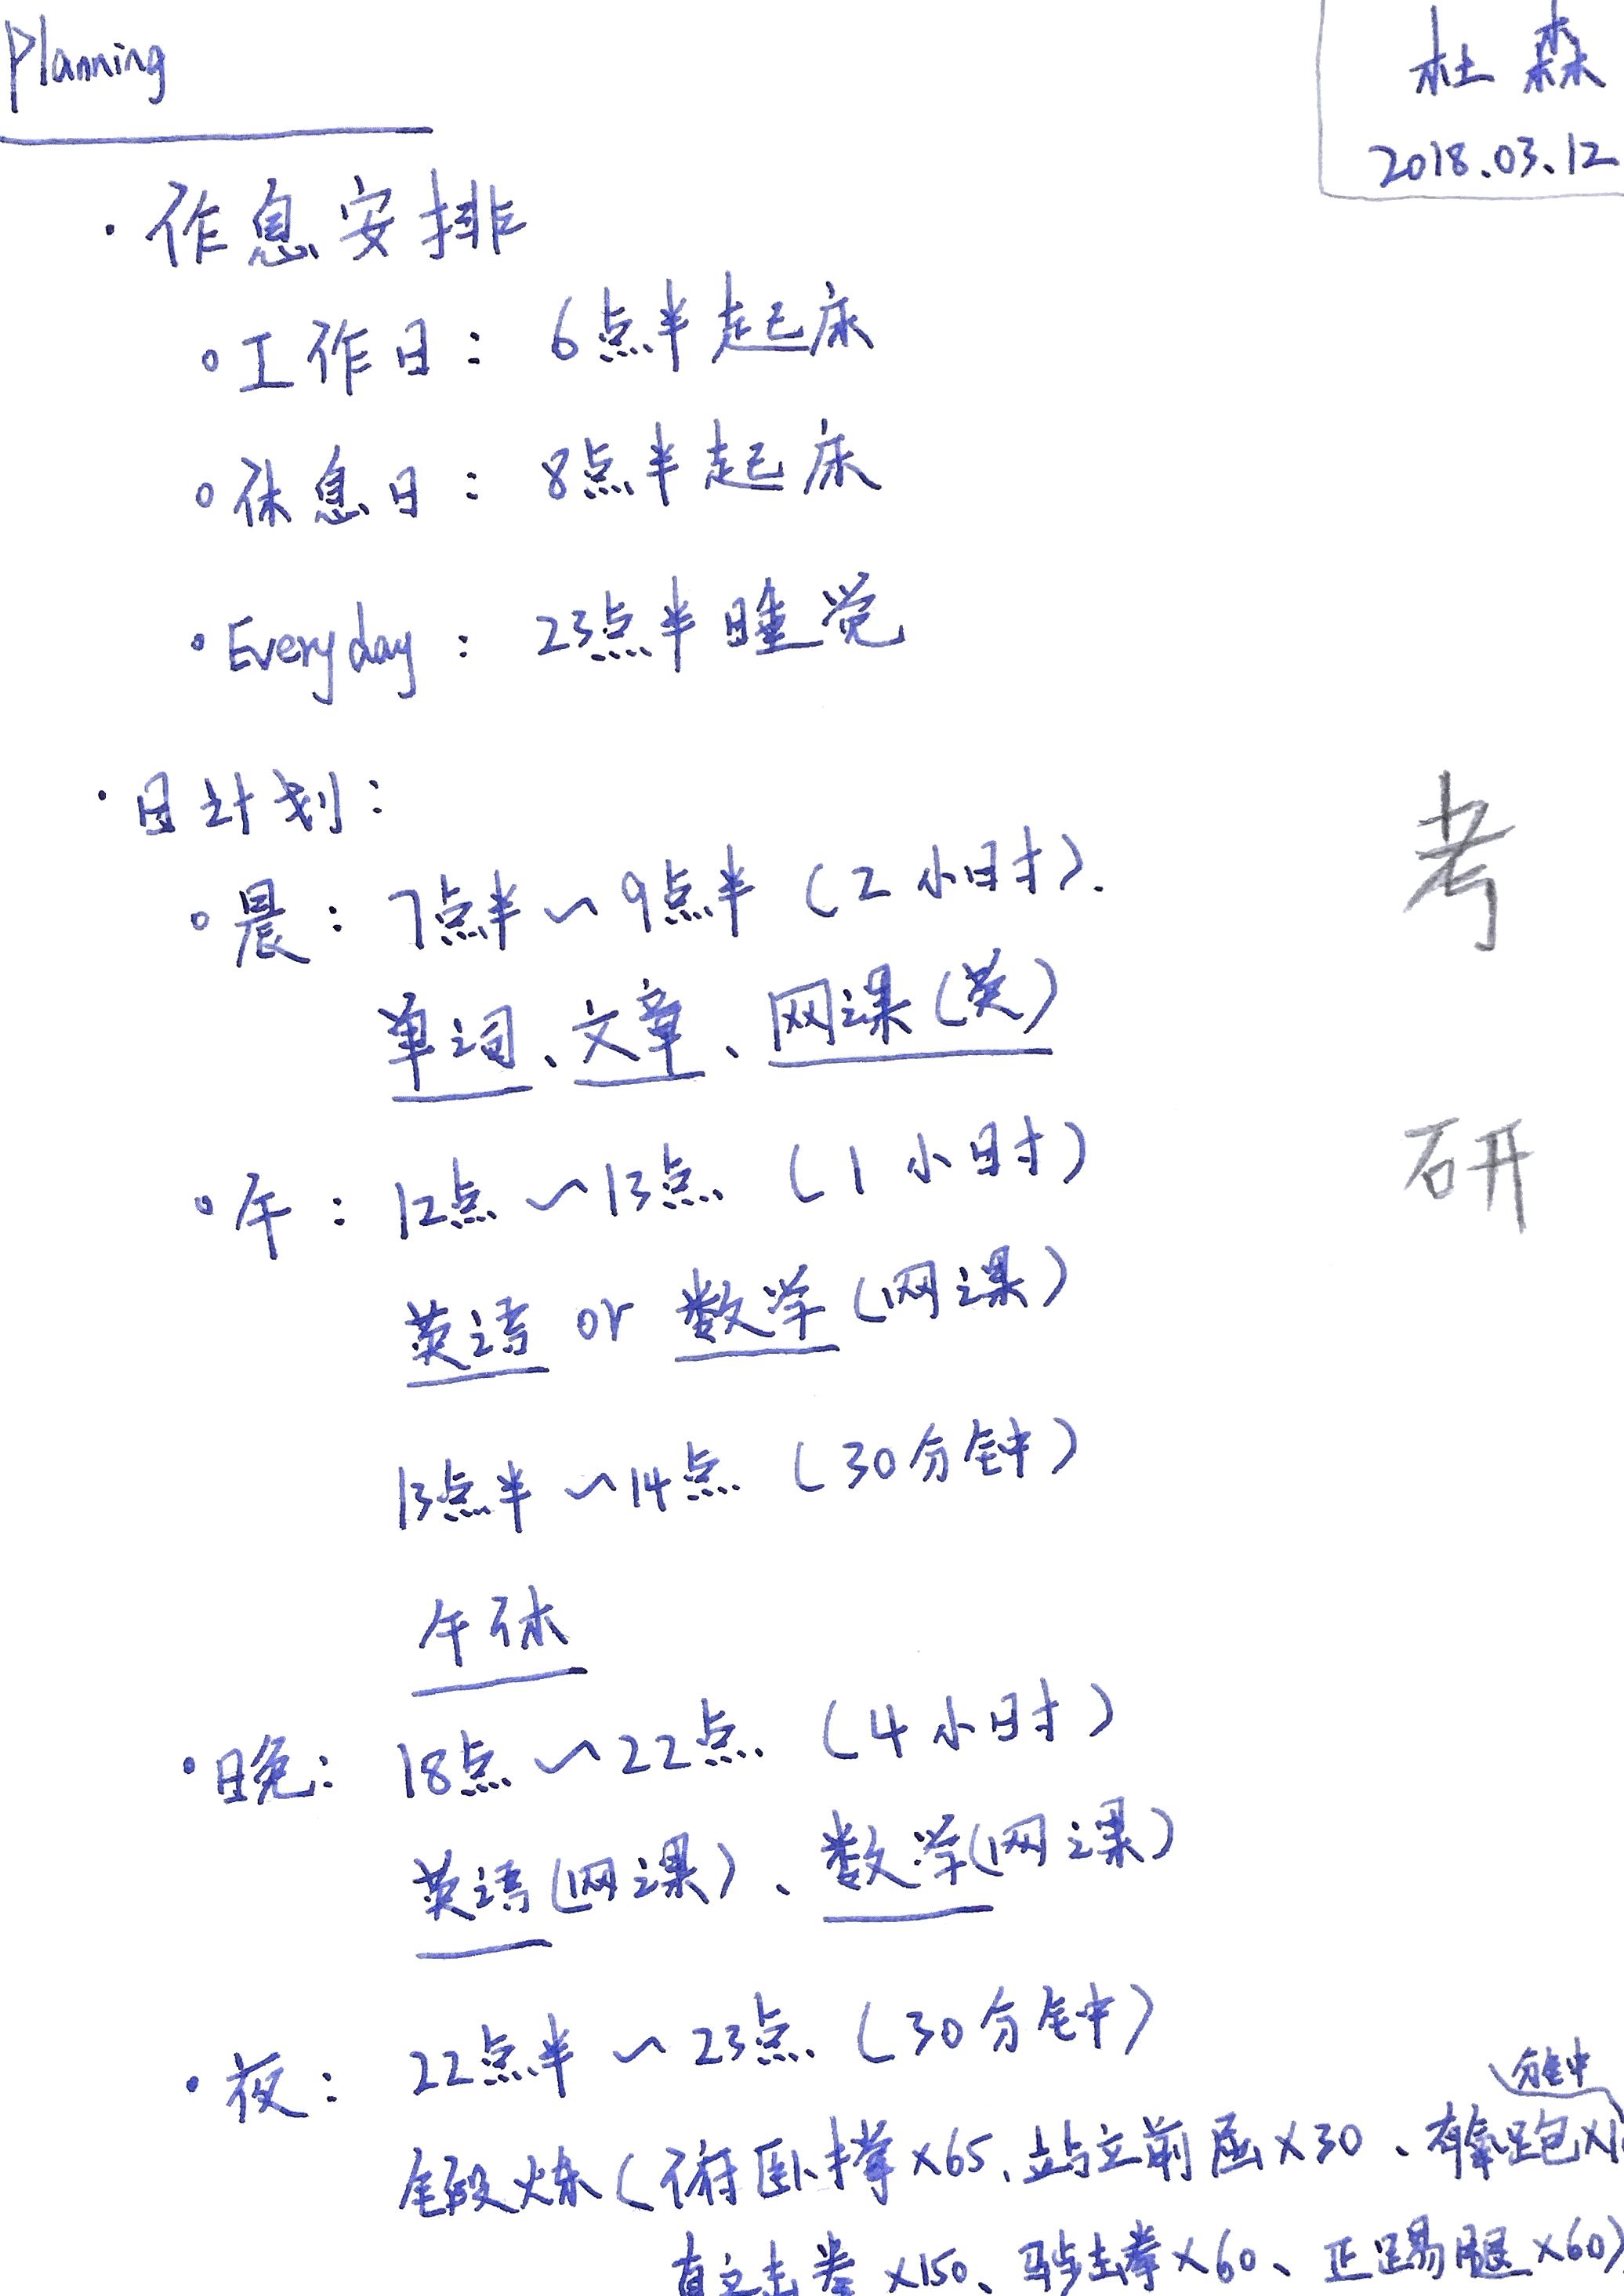 2018-03-12